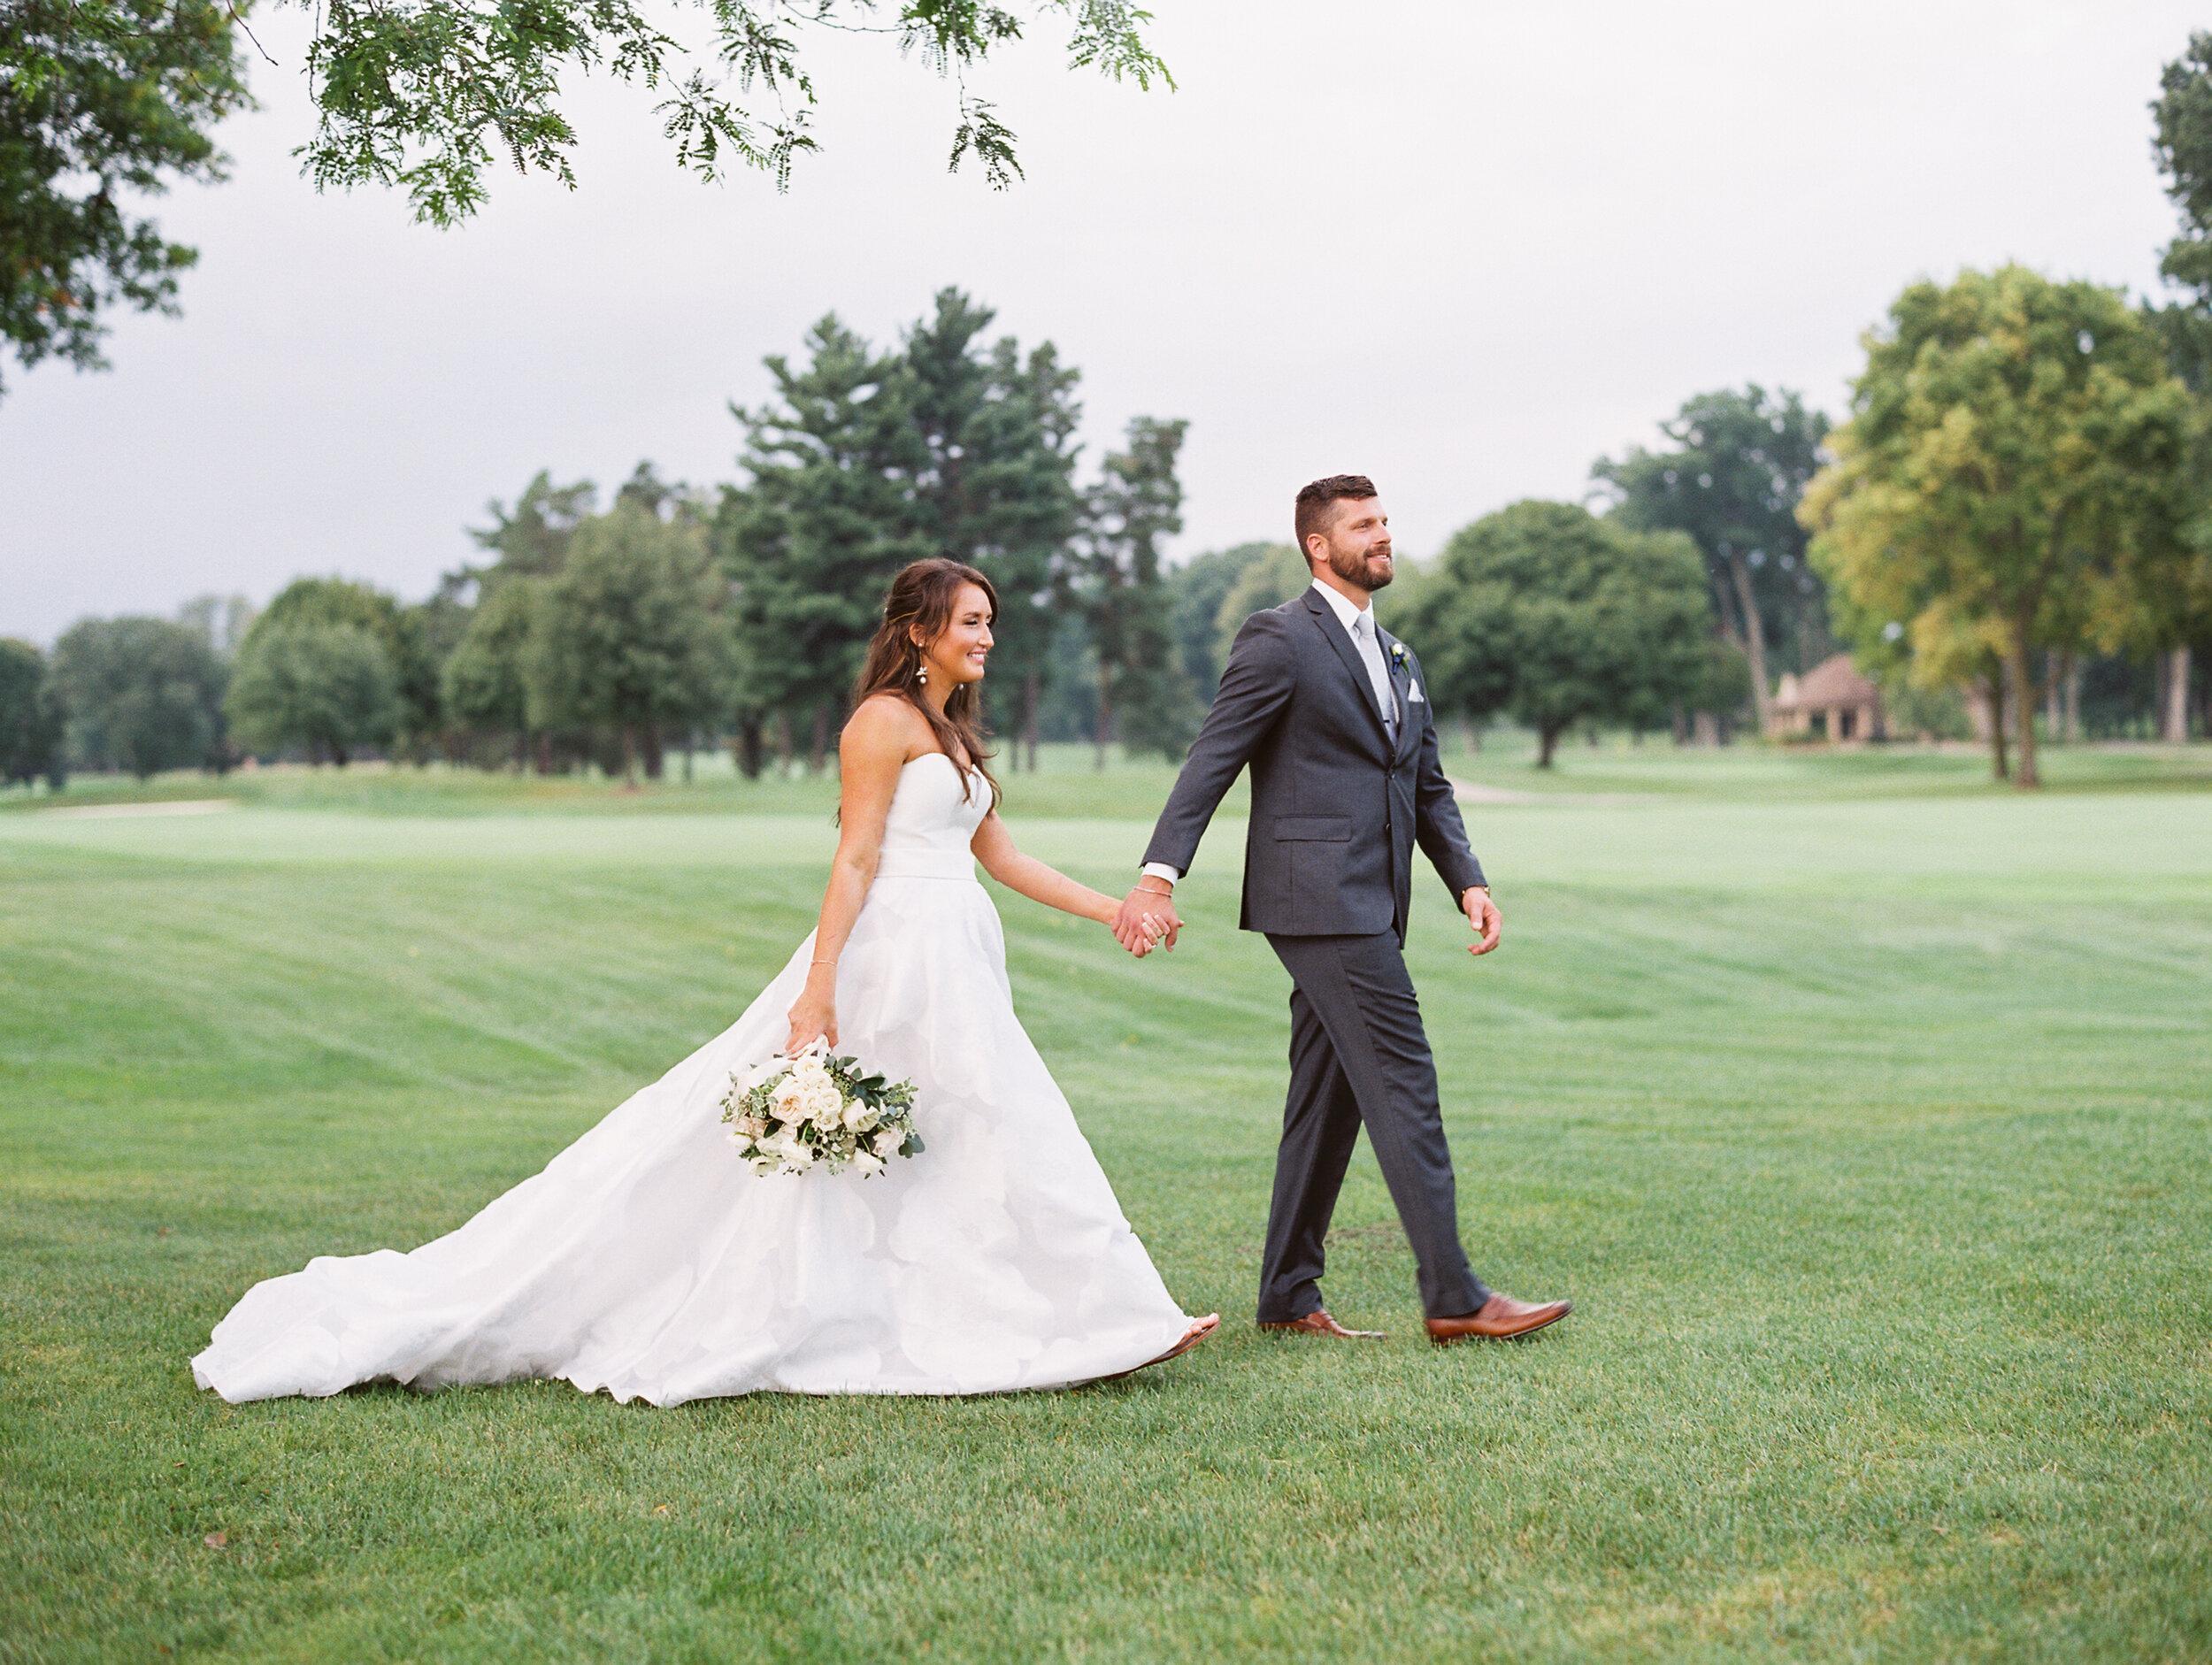 Kuiper+Wedding+Reception+Bridal+Party-165.jpg